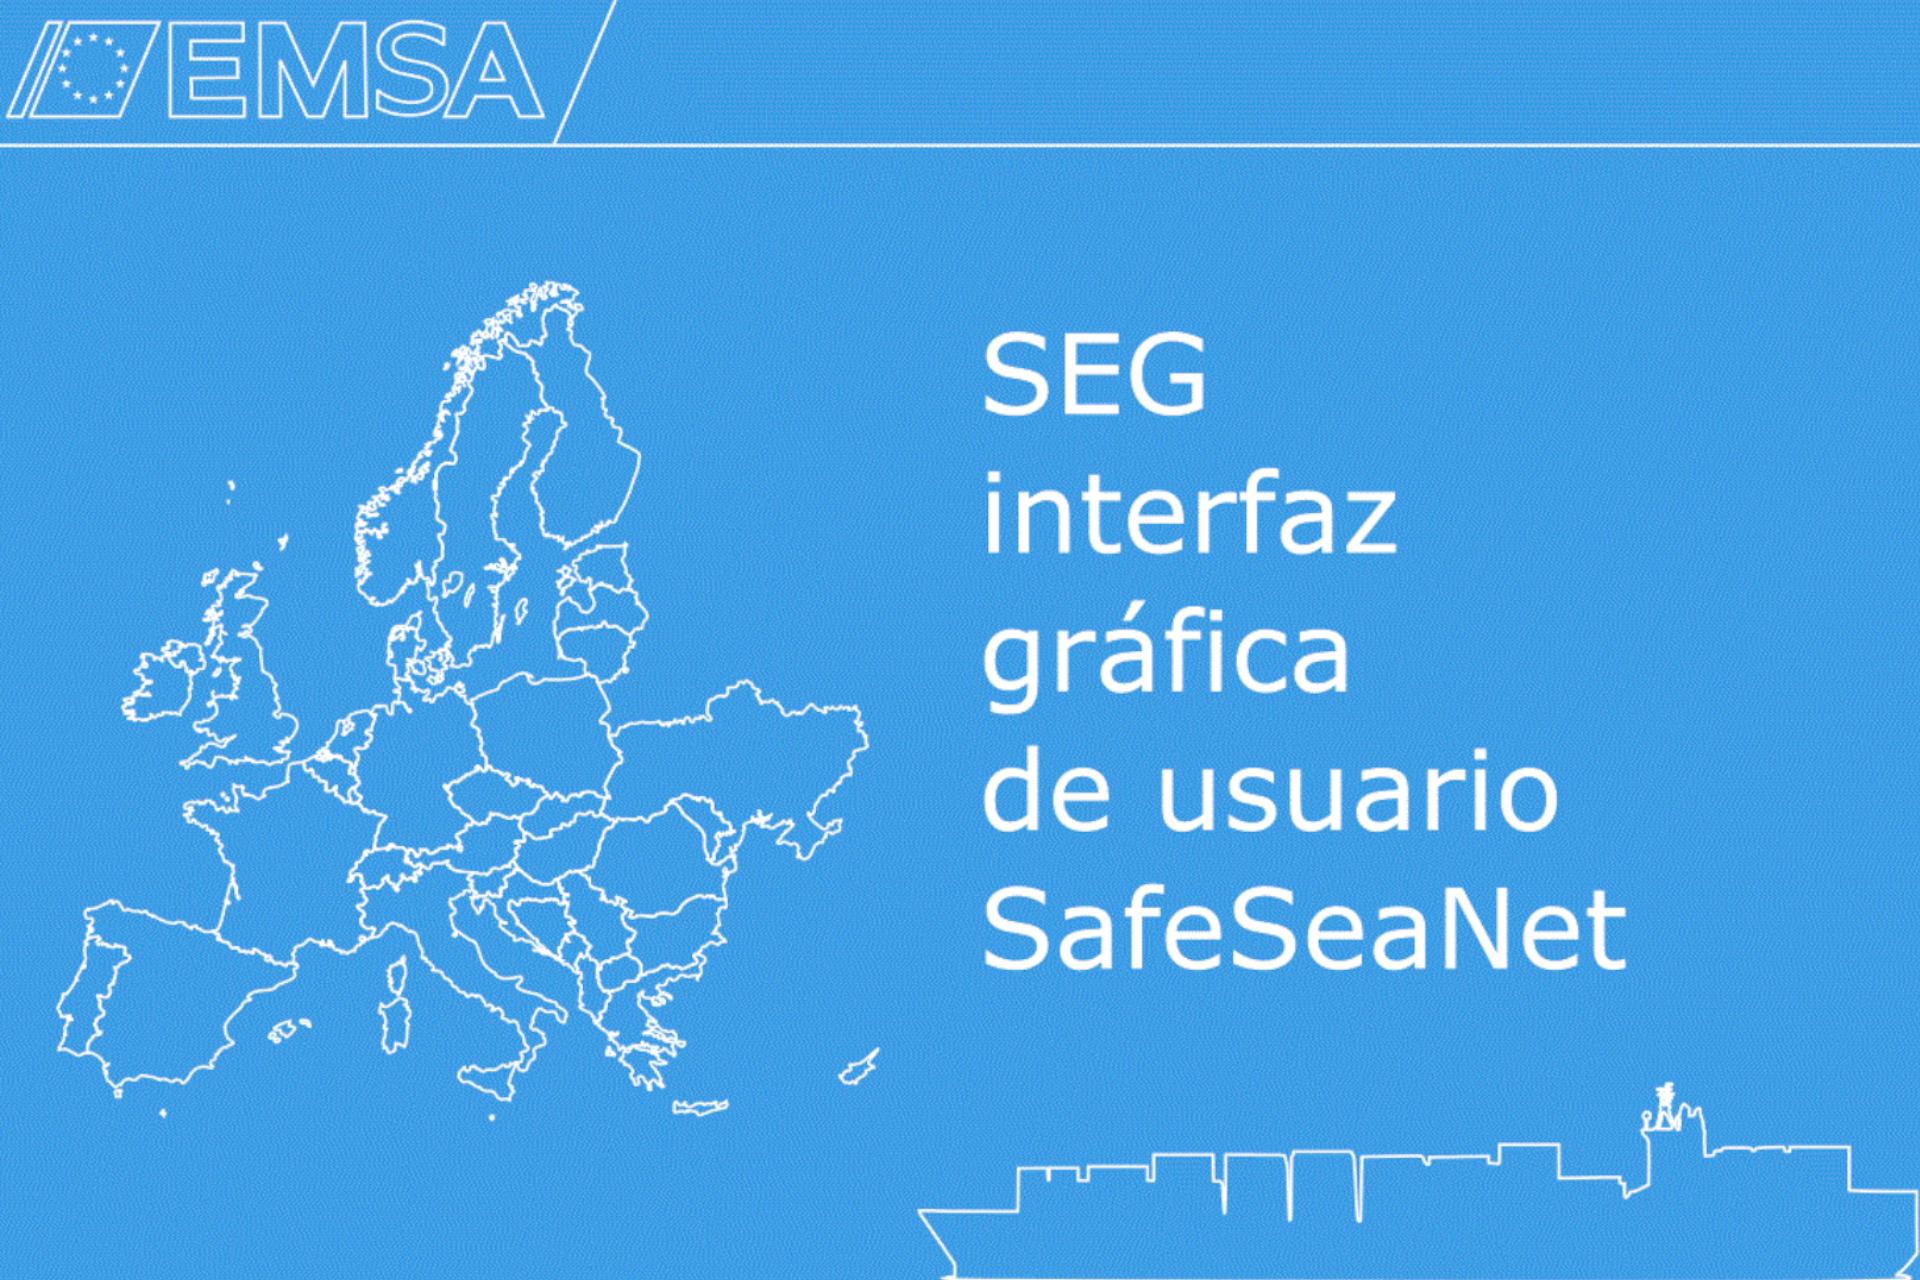 Sistema SEG - GUI Safeseanet